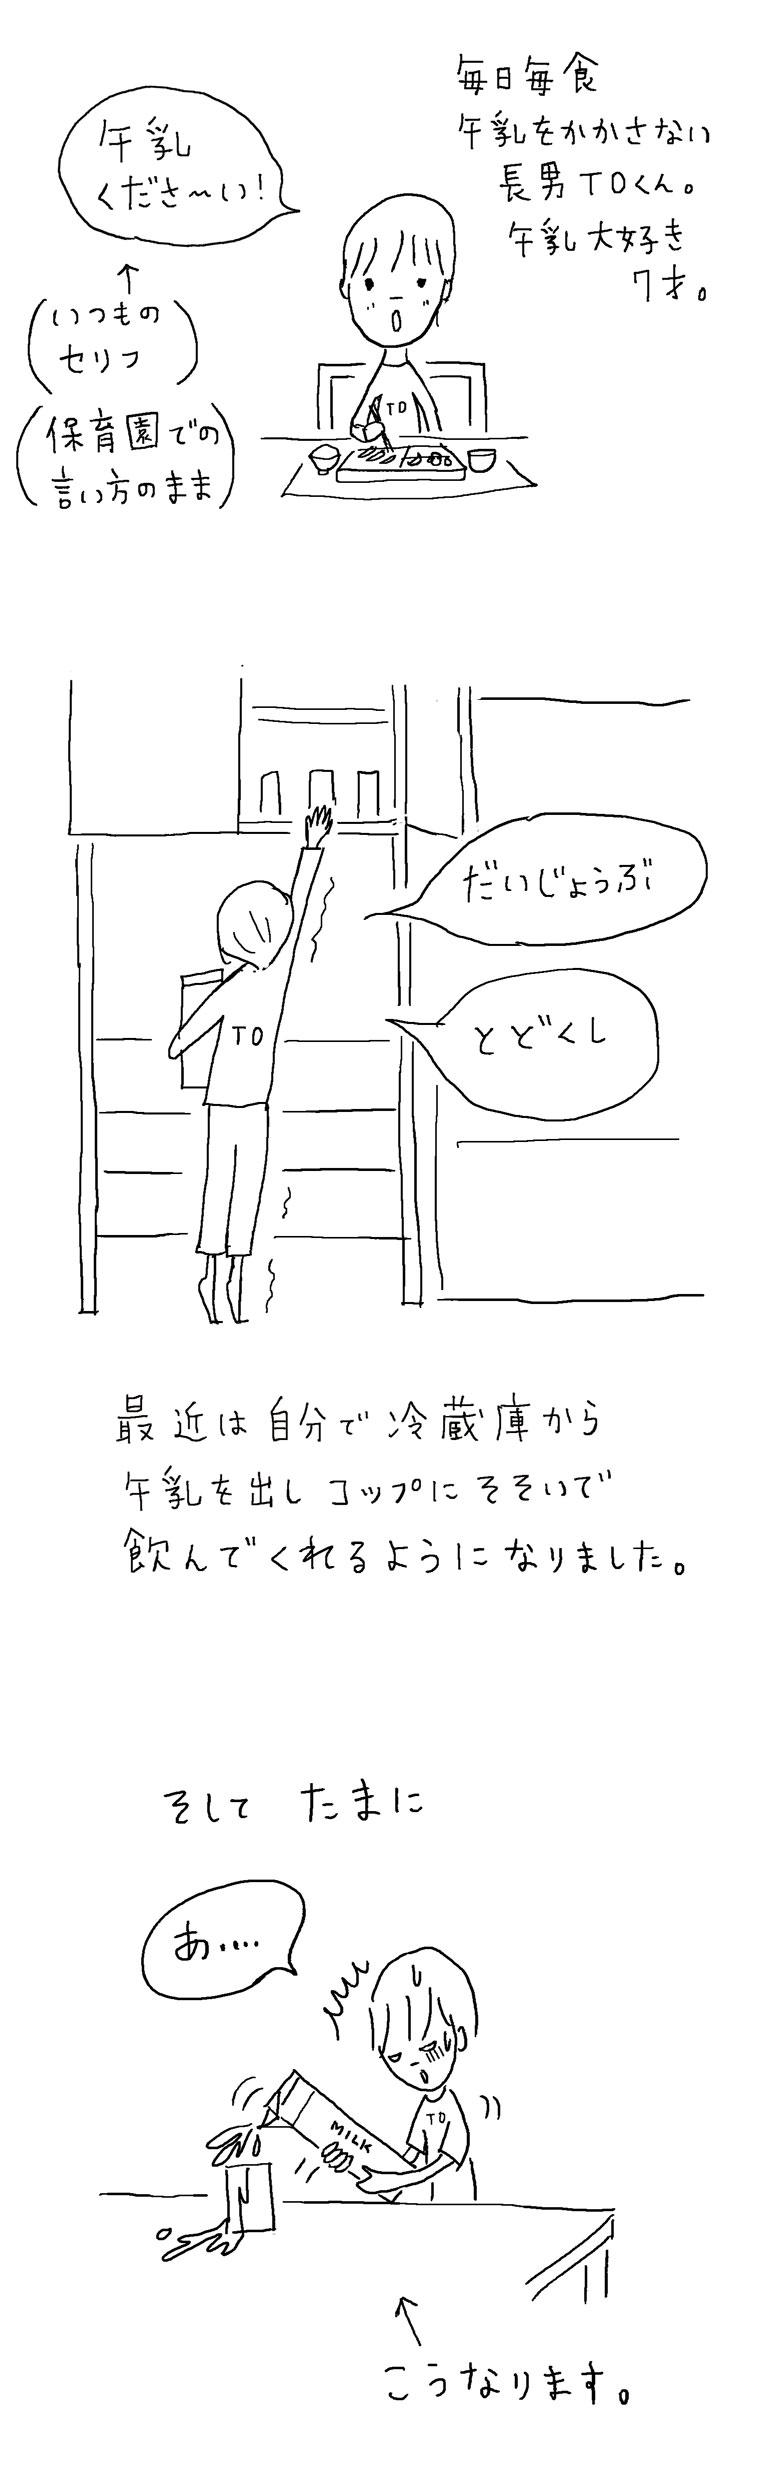 To_1.jpg